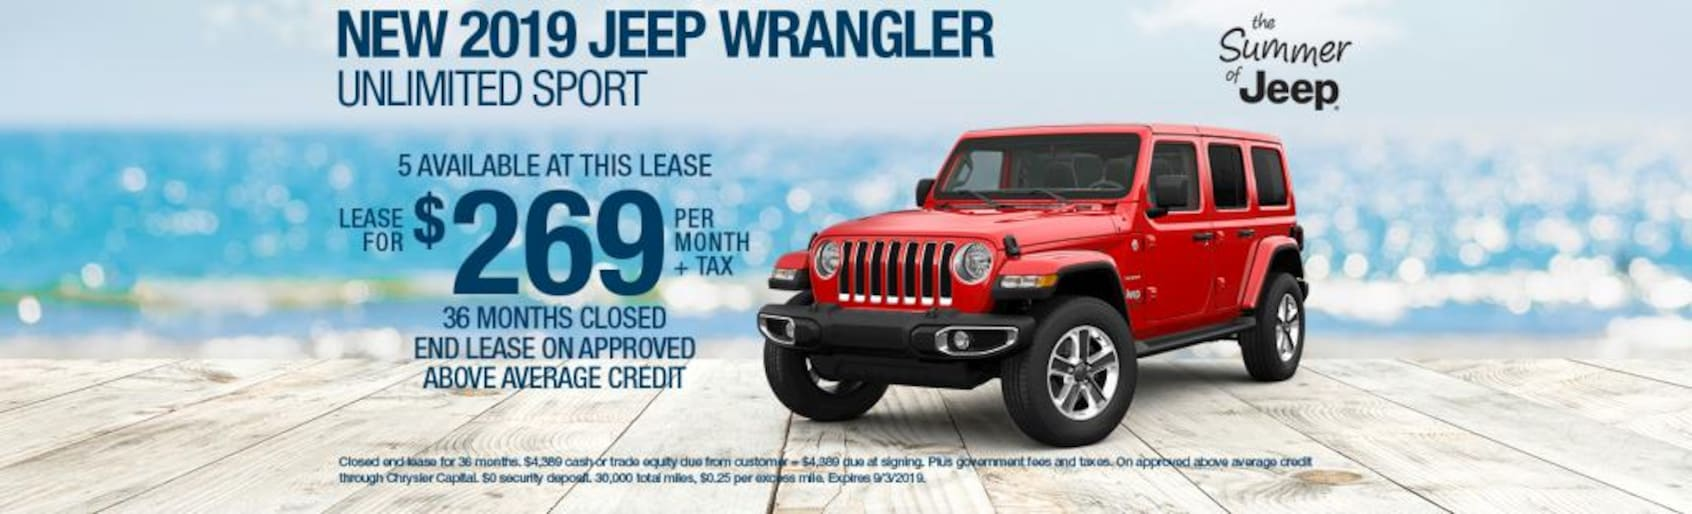 Jeep Dealership San Diego >> San Diego Chrysler Dodge Jeep Ram In San Diego New Used Car Dealer